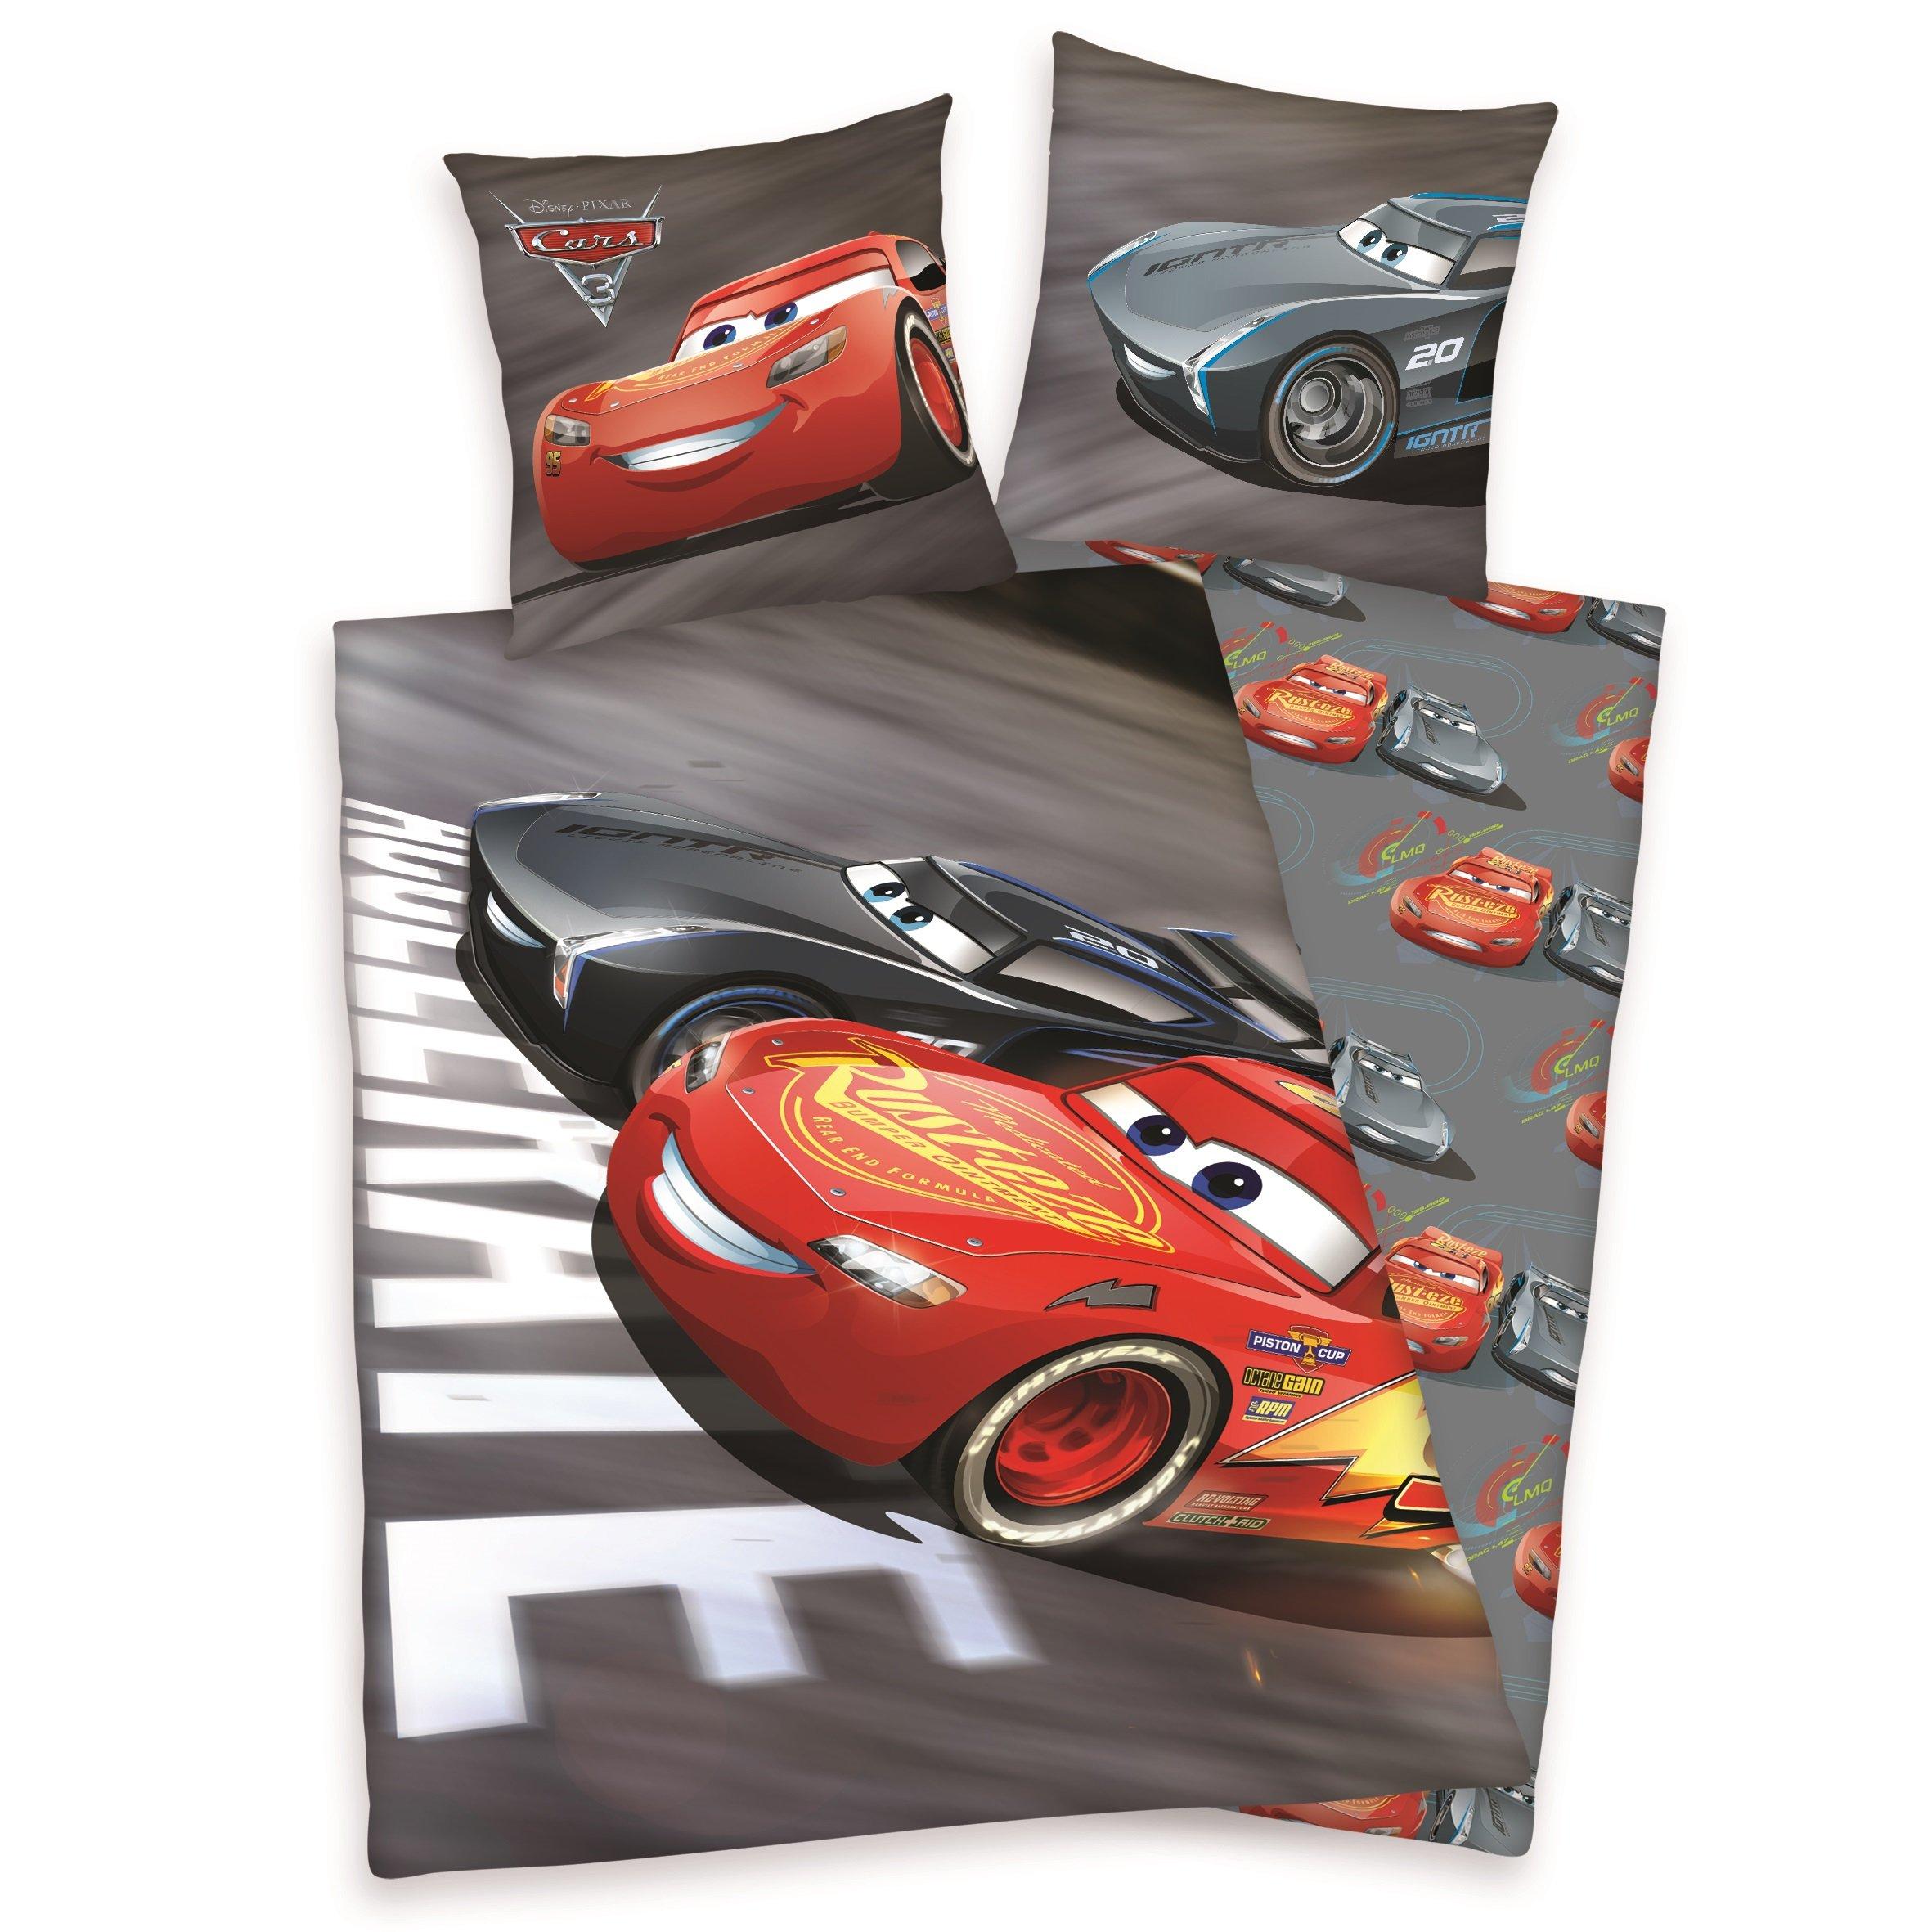 Biancheria Da Letto Disney.Herding Set Di Biancheria Da Letto Disney Cars 3 In Cotone 200 X